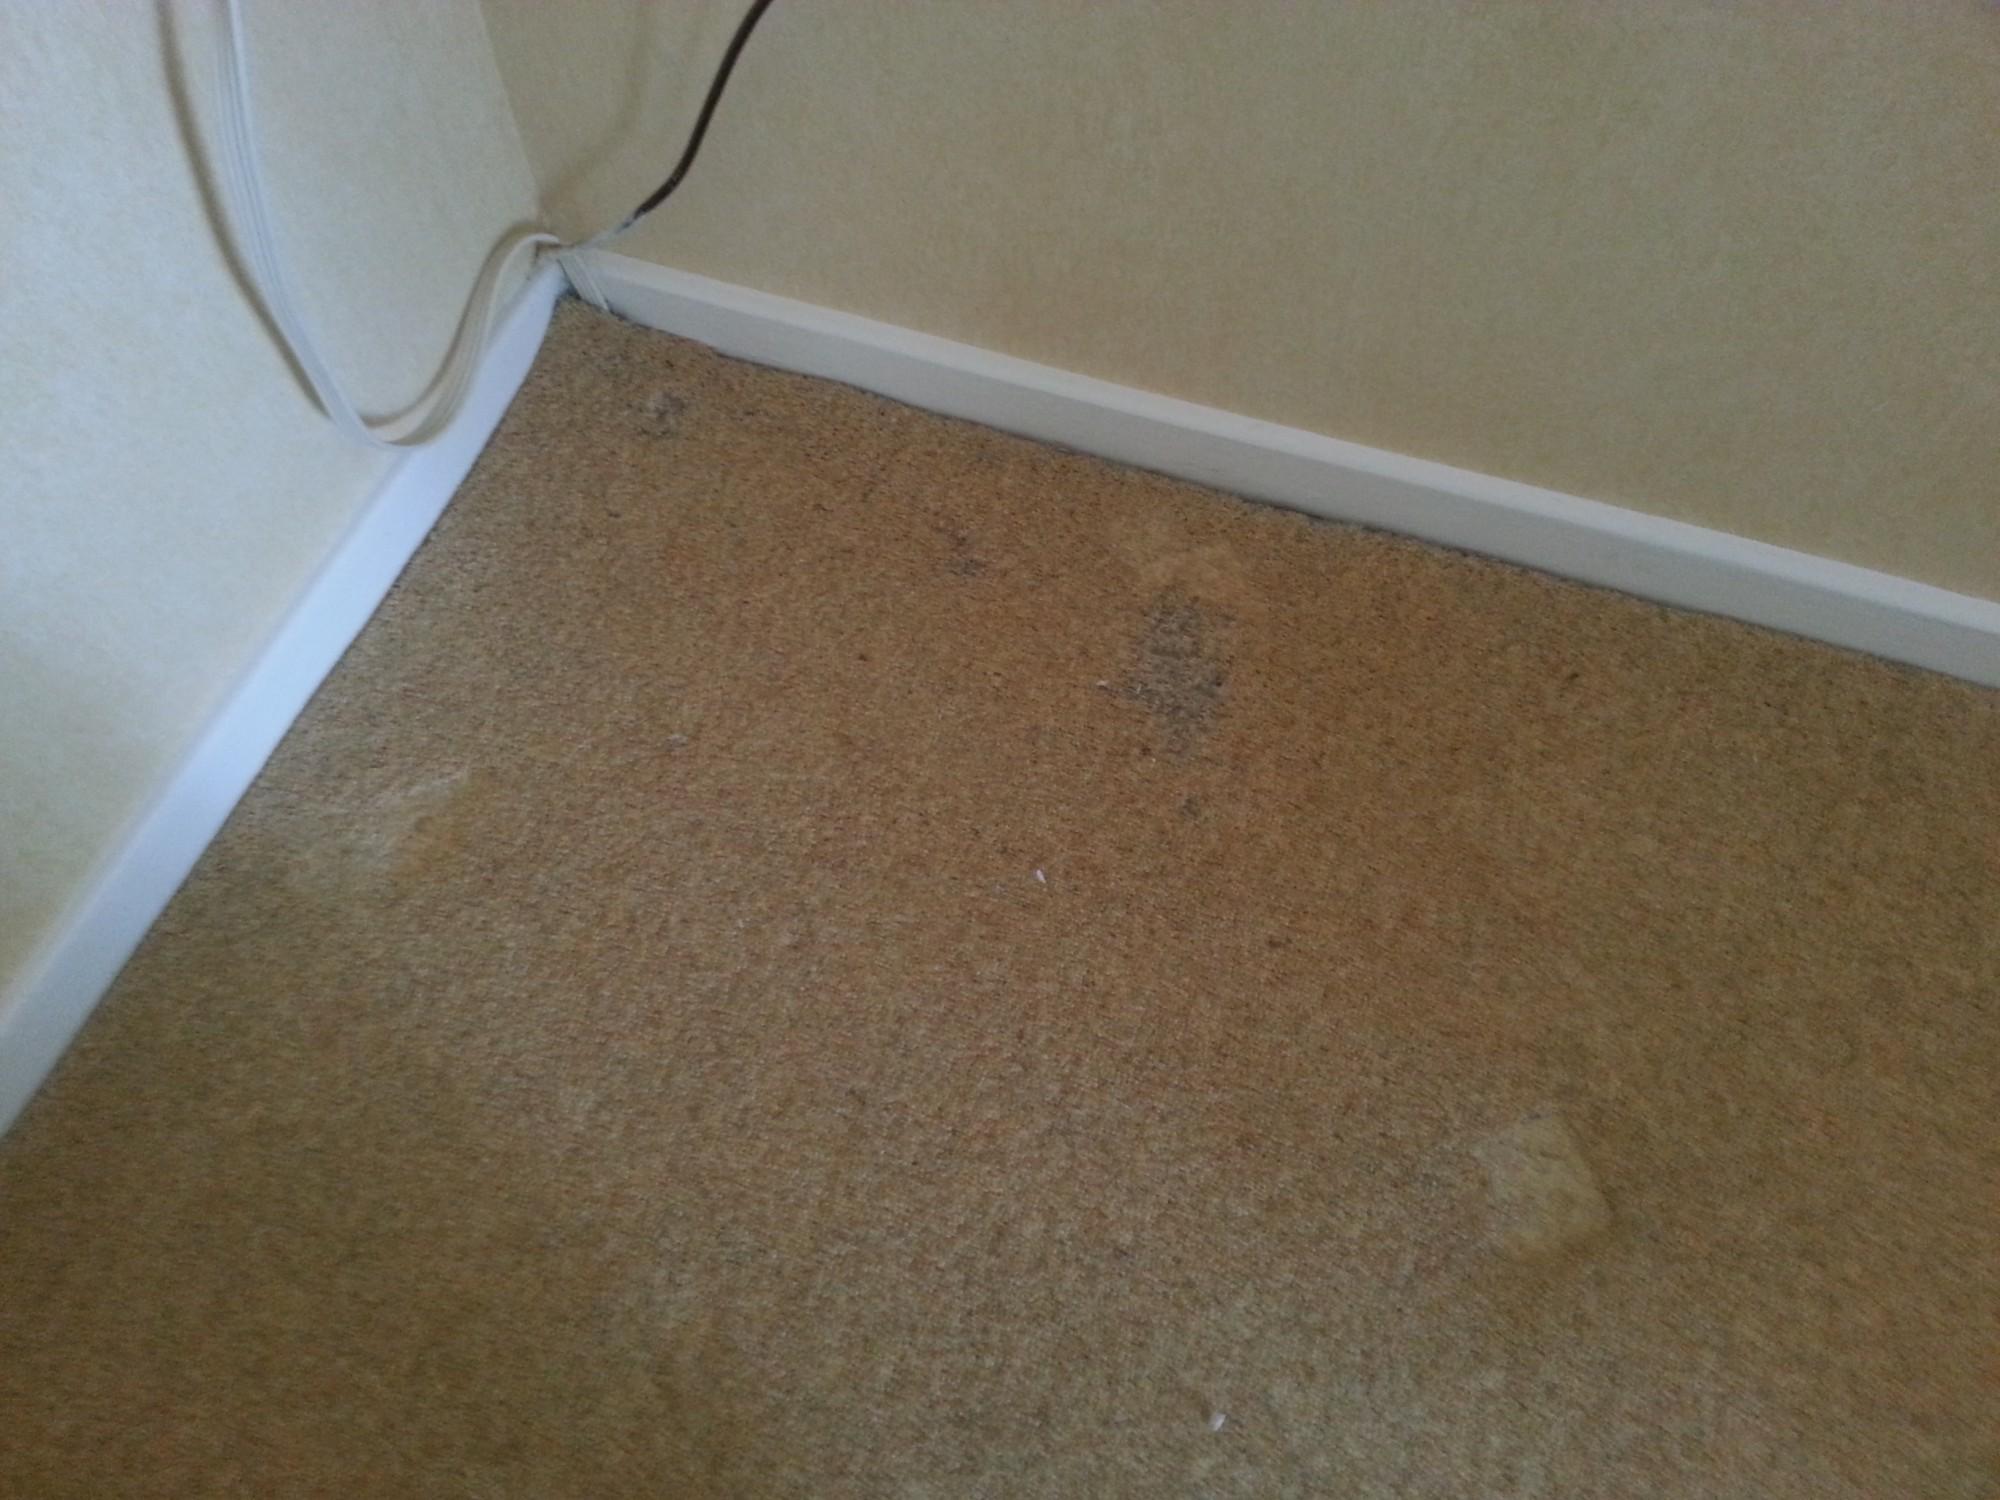 Do My Carpets Have Carpet Moth Five Star Furnishing Care